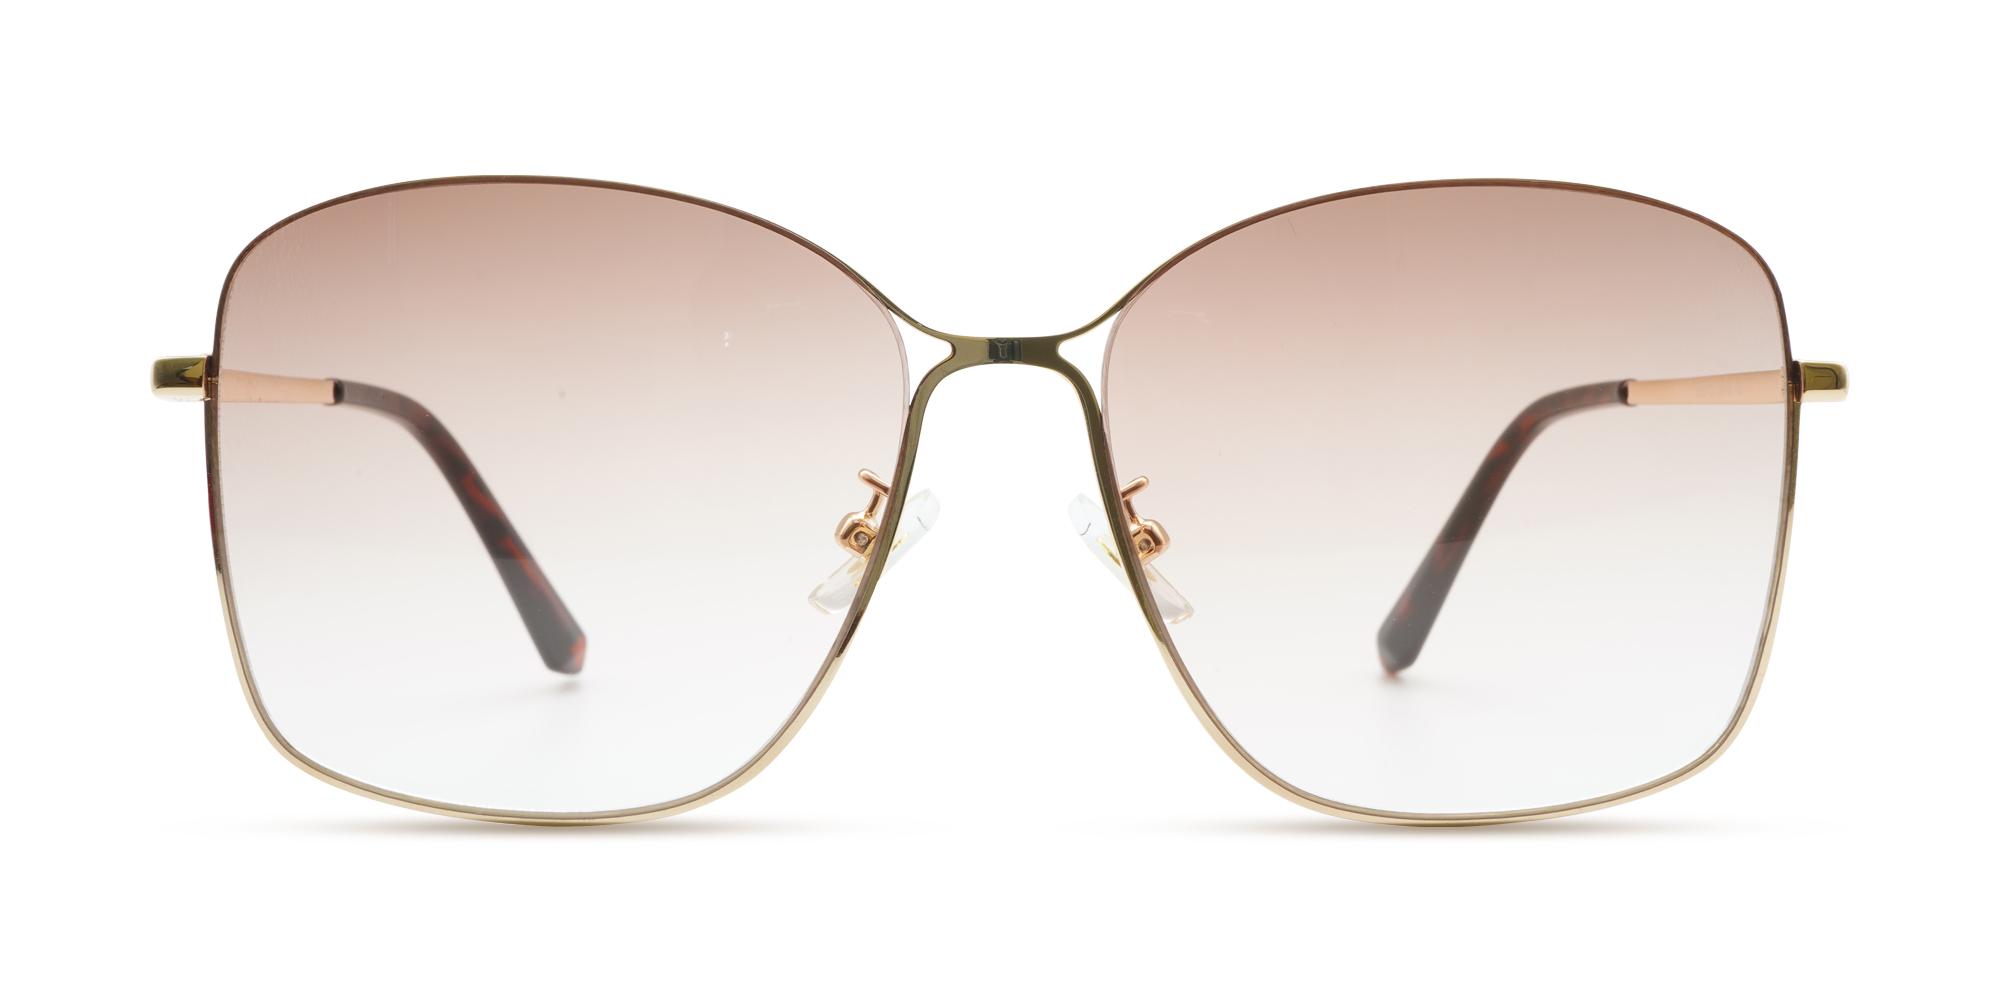 Homell Sunglasses Gold - Women Prescription Sunglasses